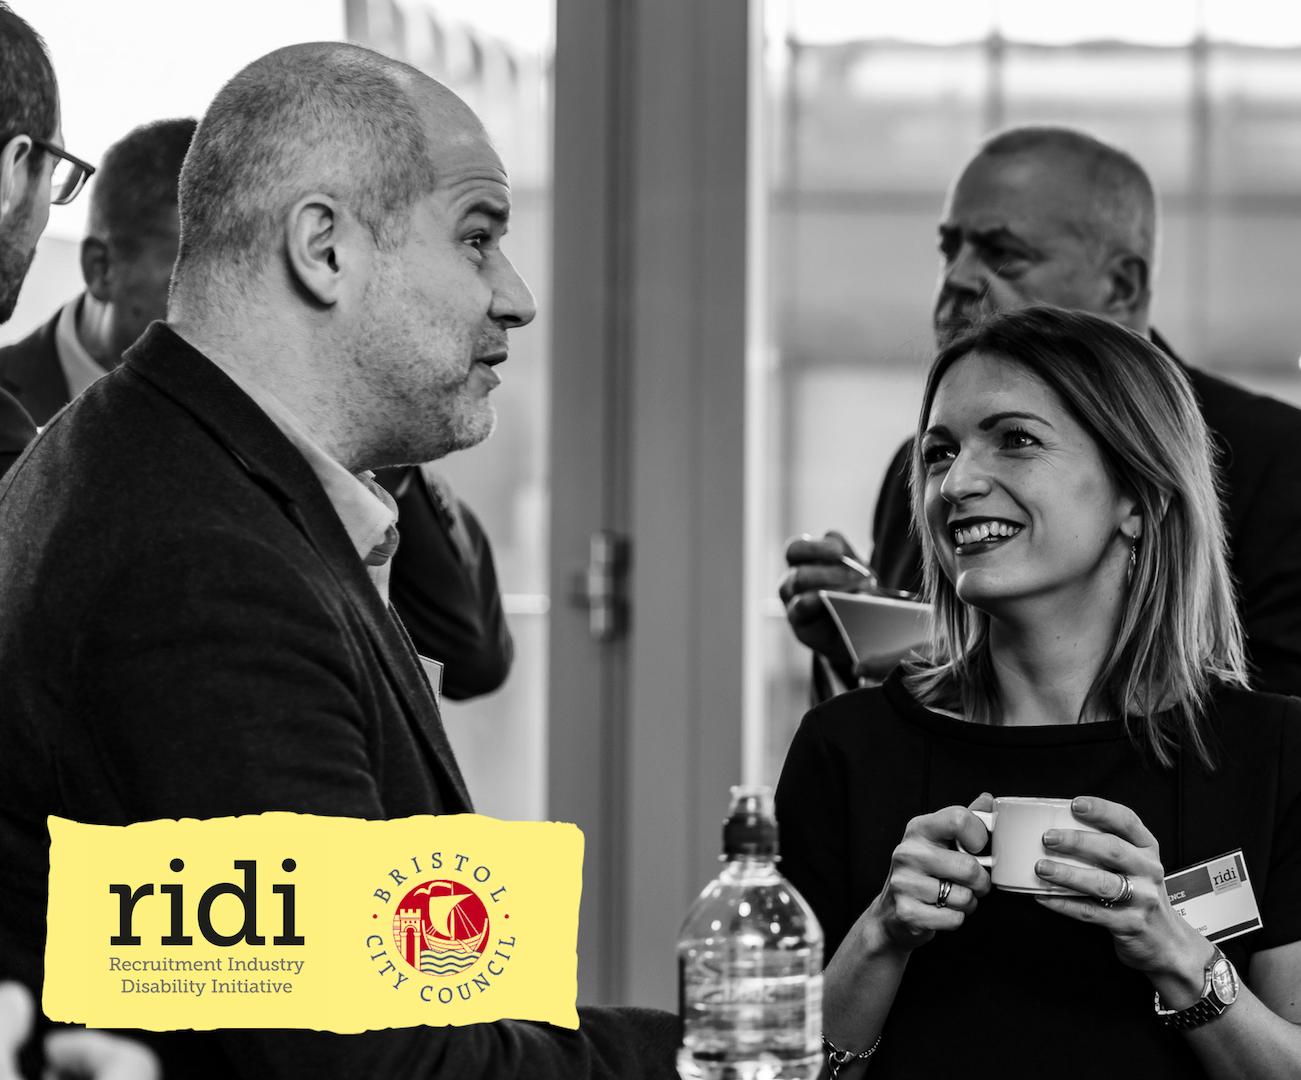 Photo of people at RIDI Awards with RIDI logo and Bristol City Council logo